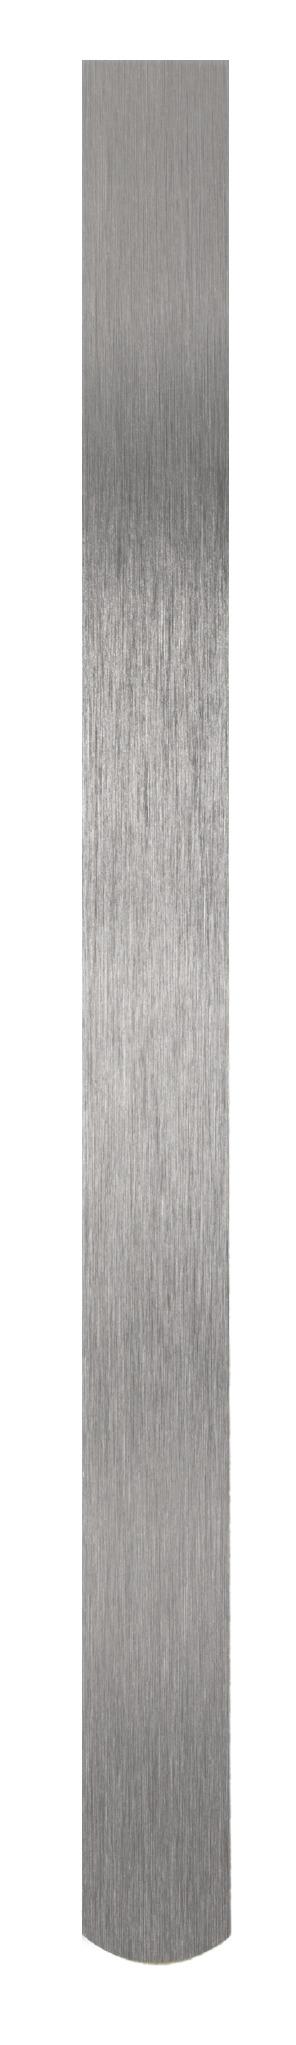 Creartec Rührspatel Aluminium